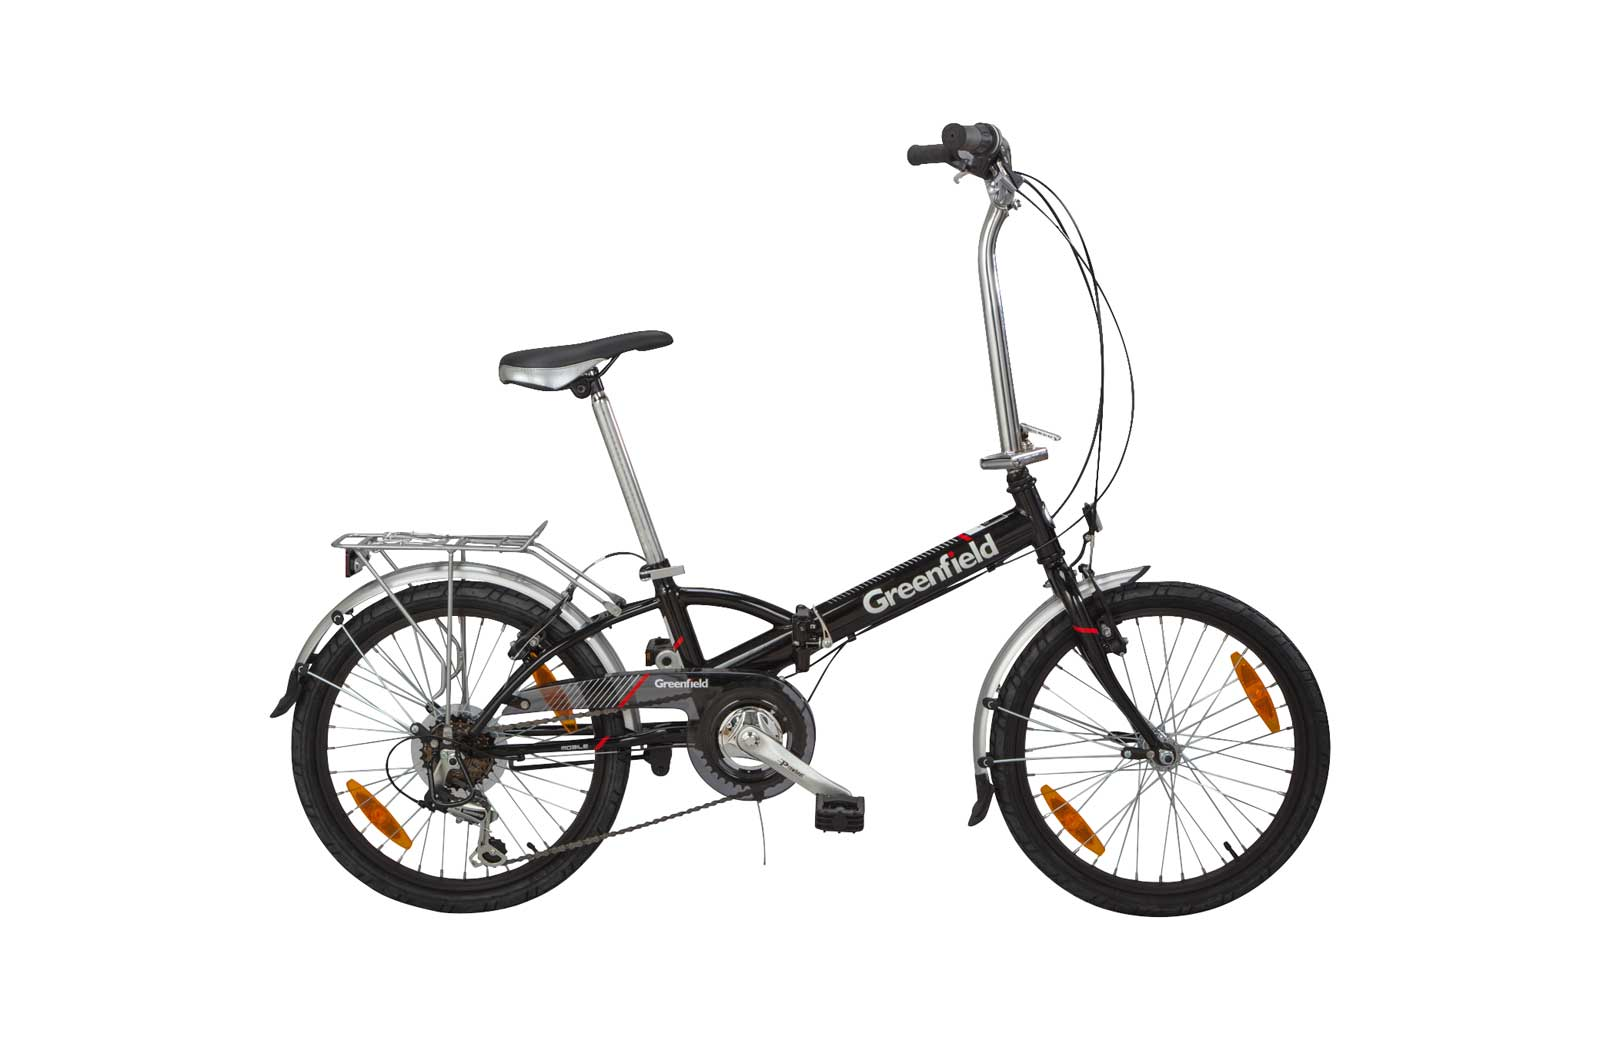 mekställ cykel harald nyborg